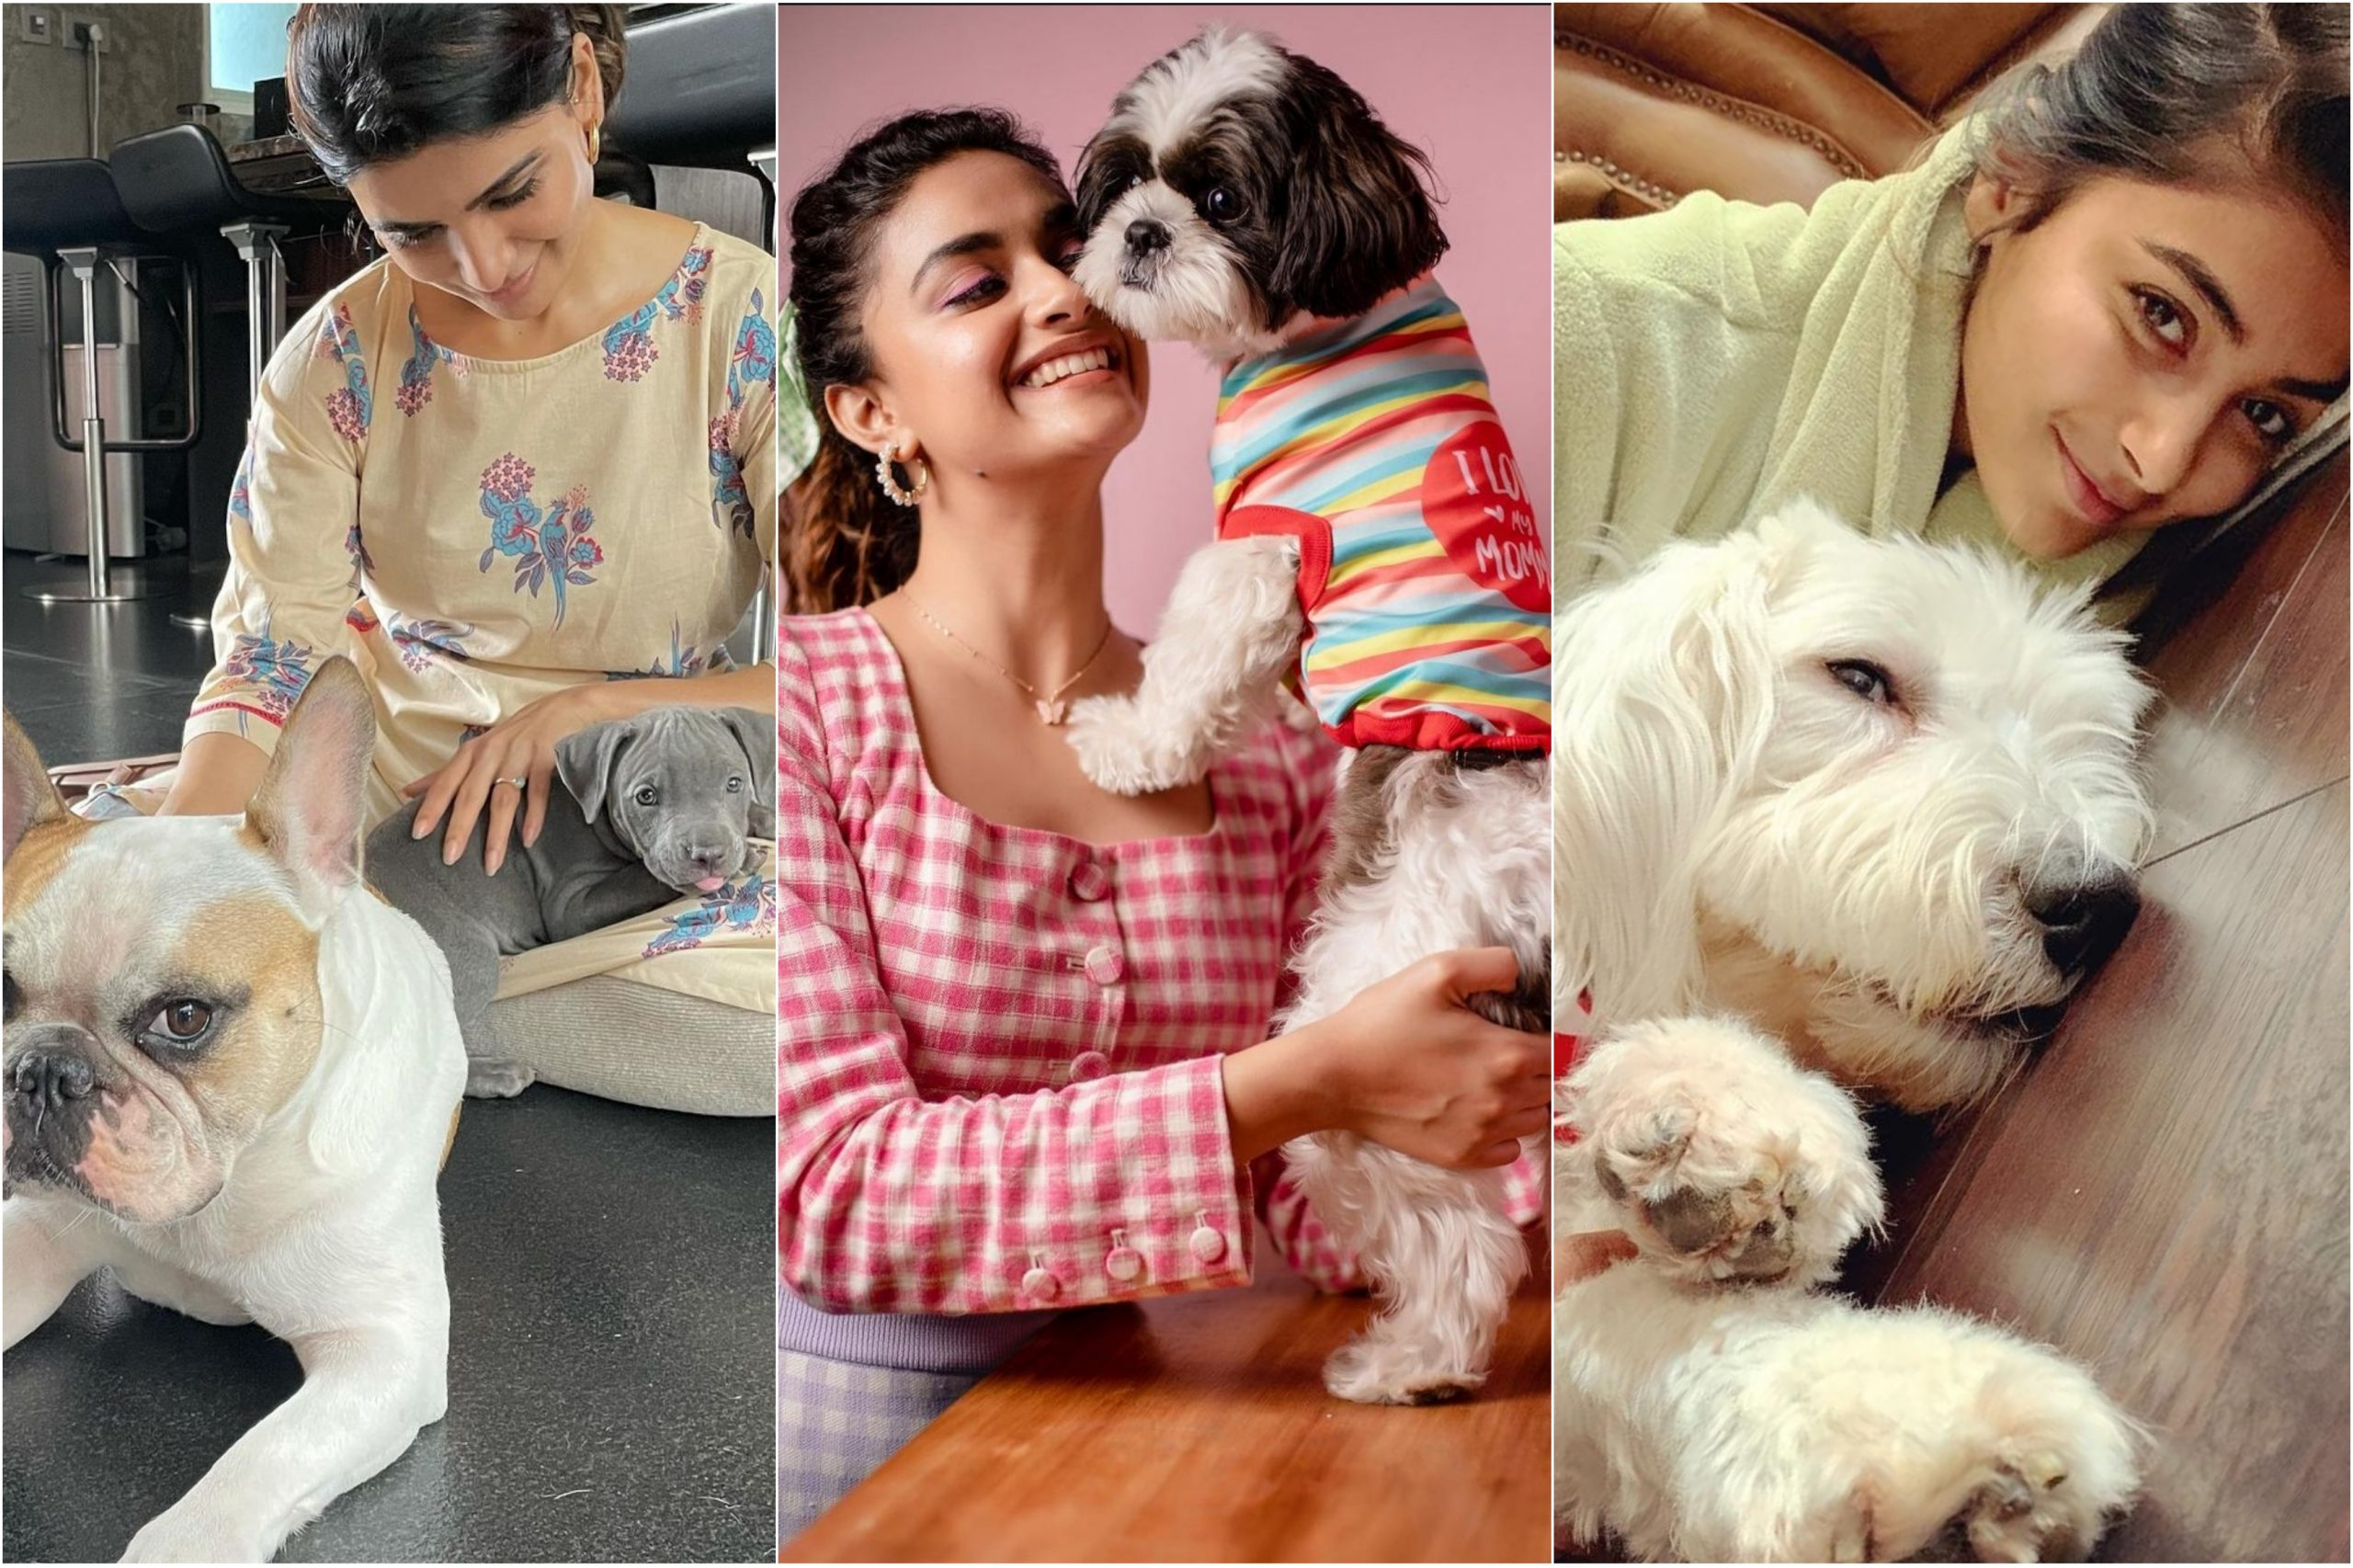 From Mahesh Babu to Samantha Ruth Prabhu, actors who are proud pet parents